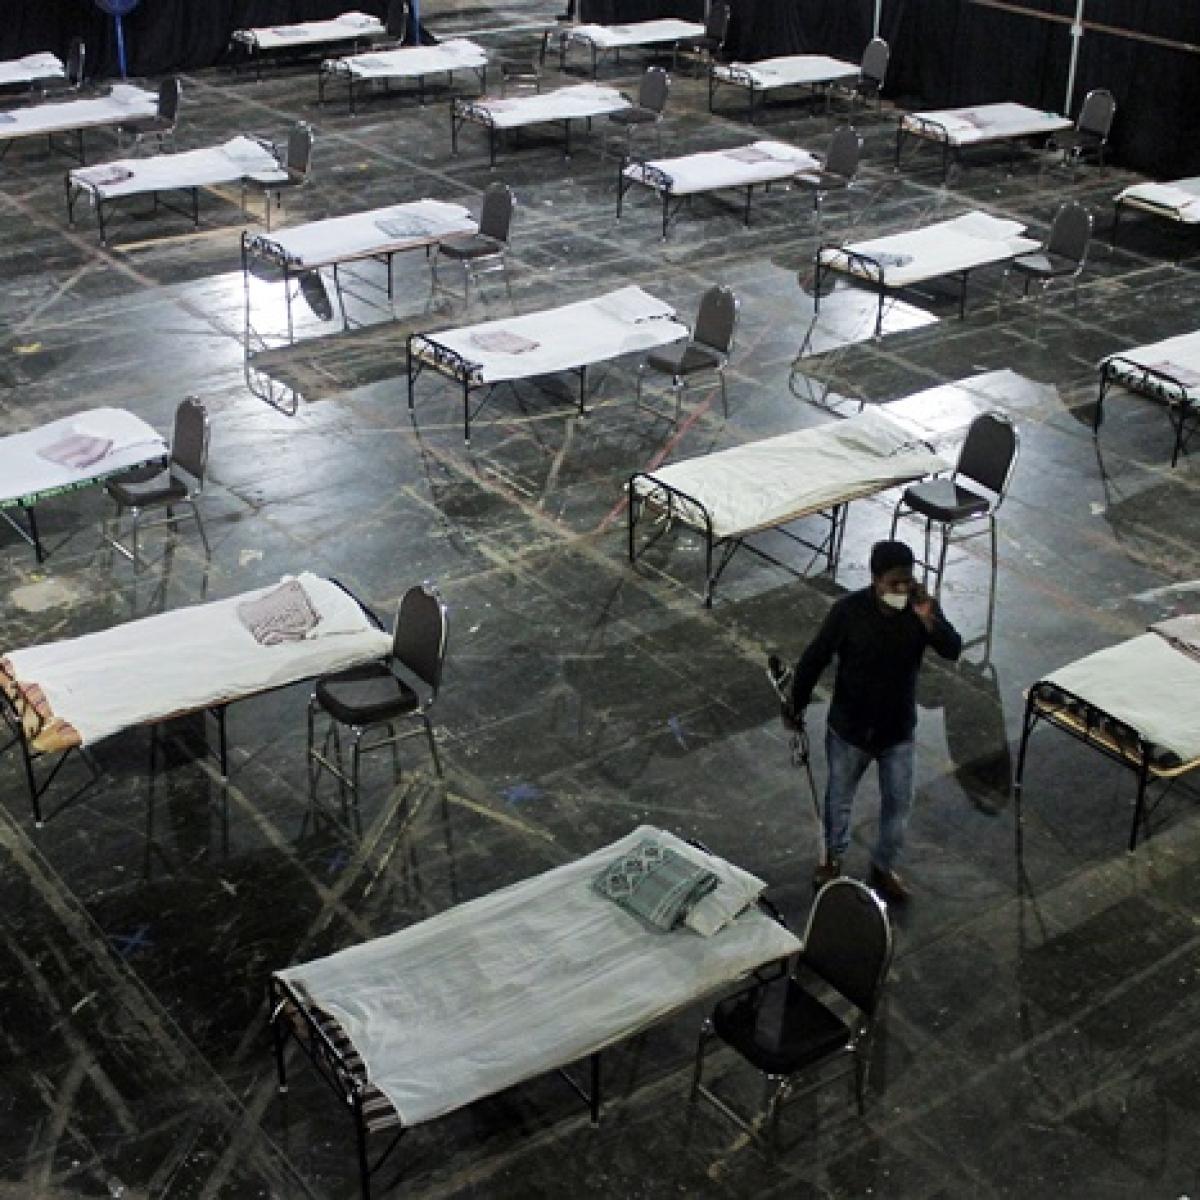 Coronavirus in Mumbai: BMC to set up quarantine facilities in hostels, stadiums, lodges